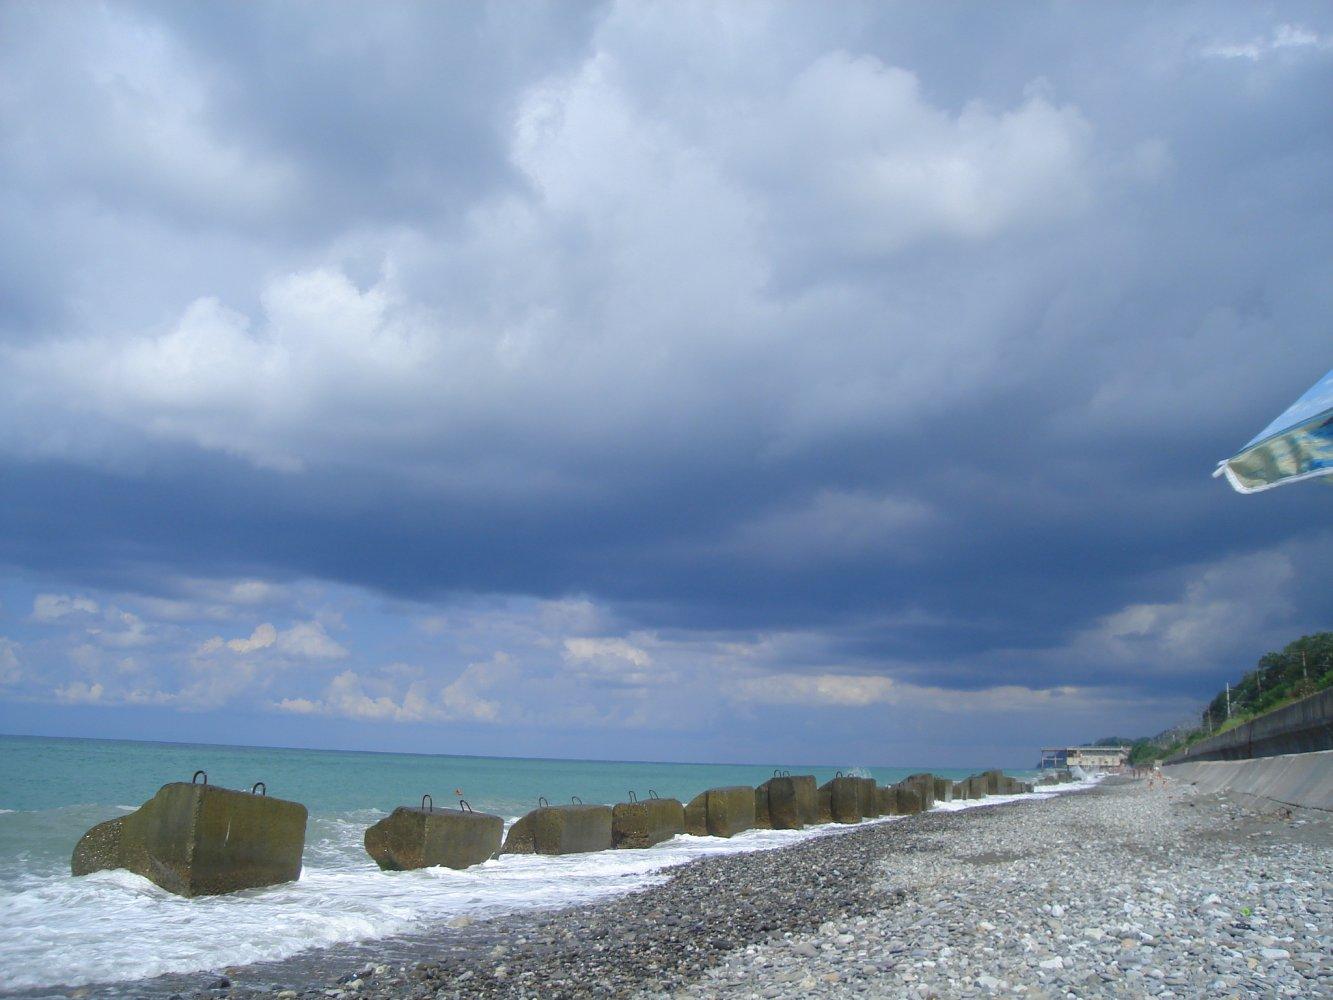 Якорная щель фото пляжа 2018